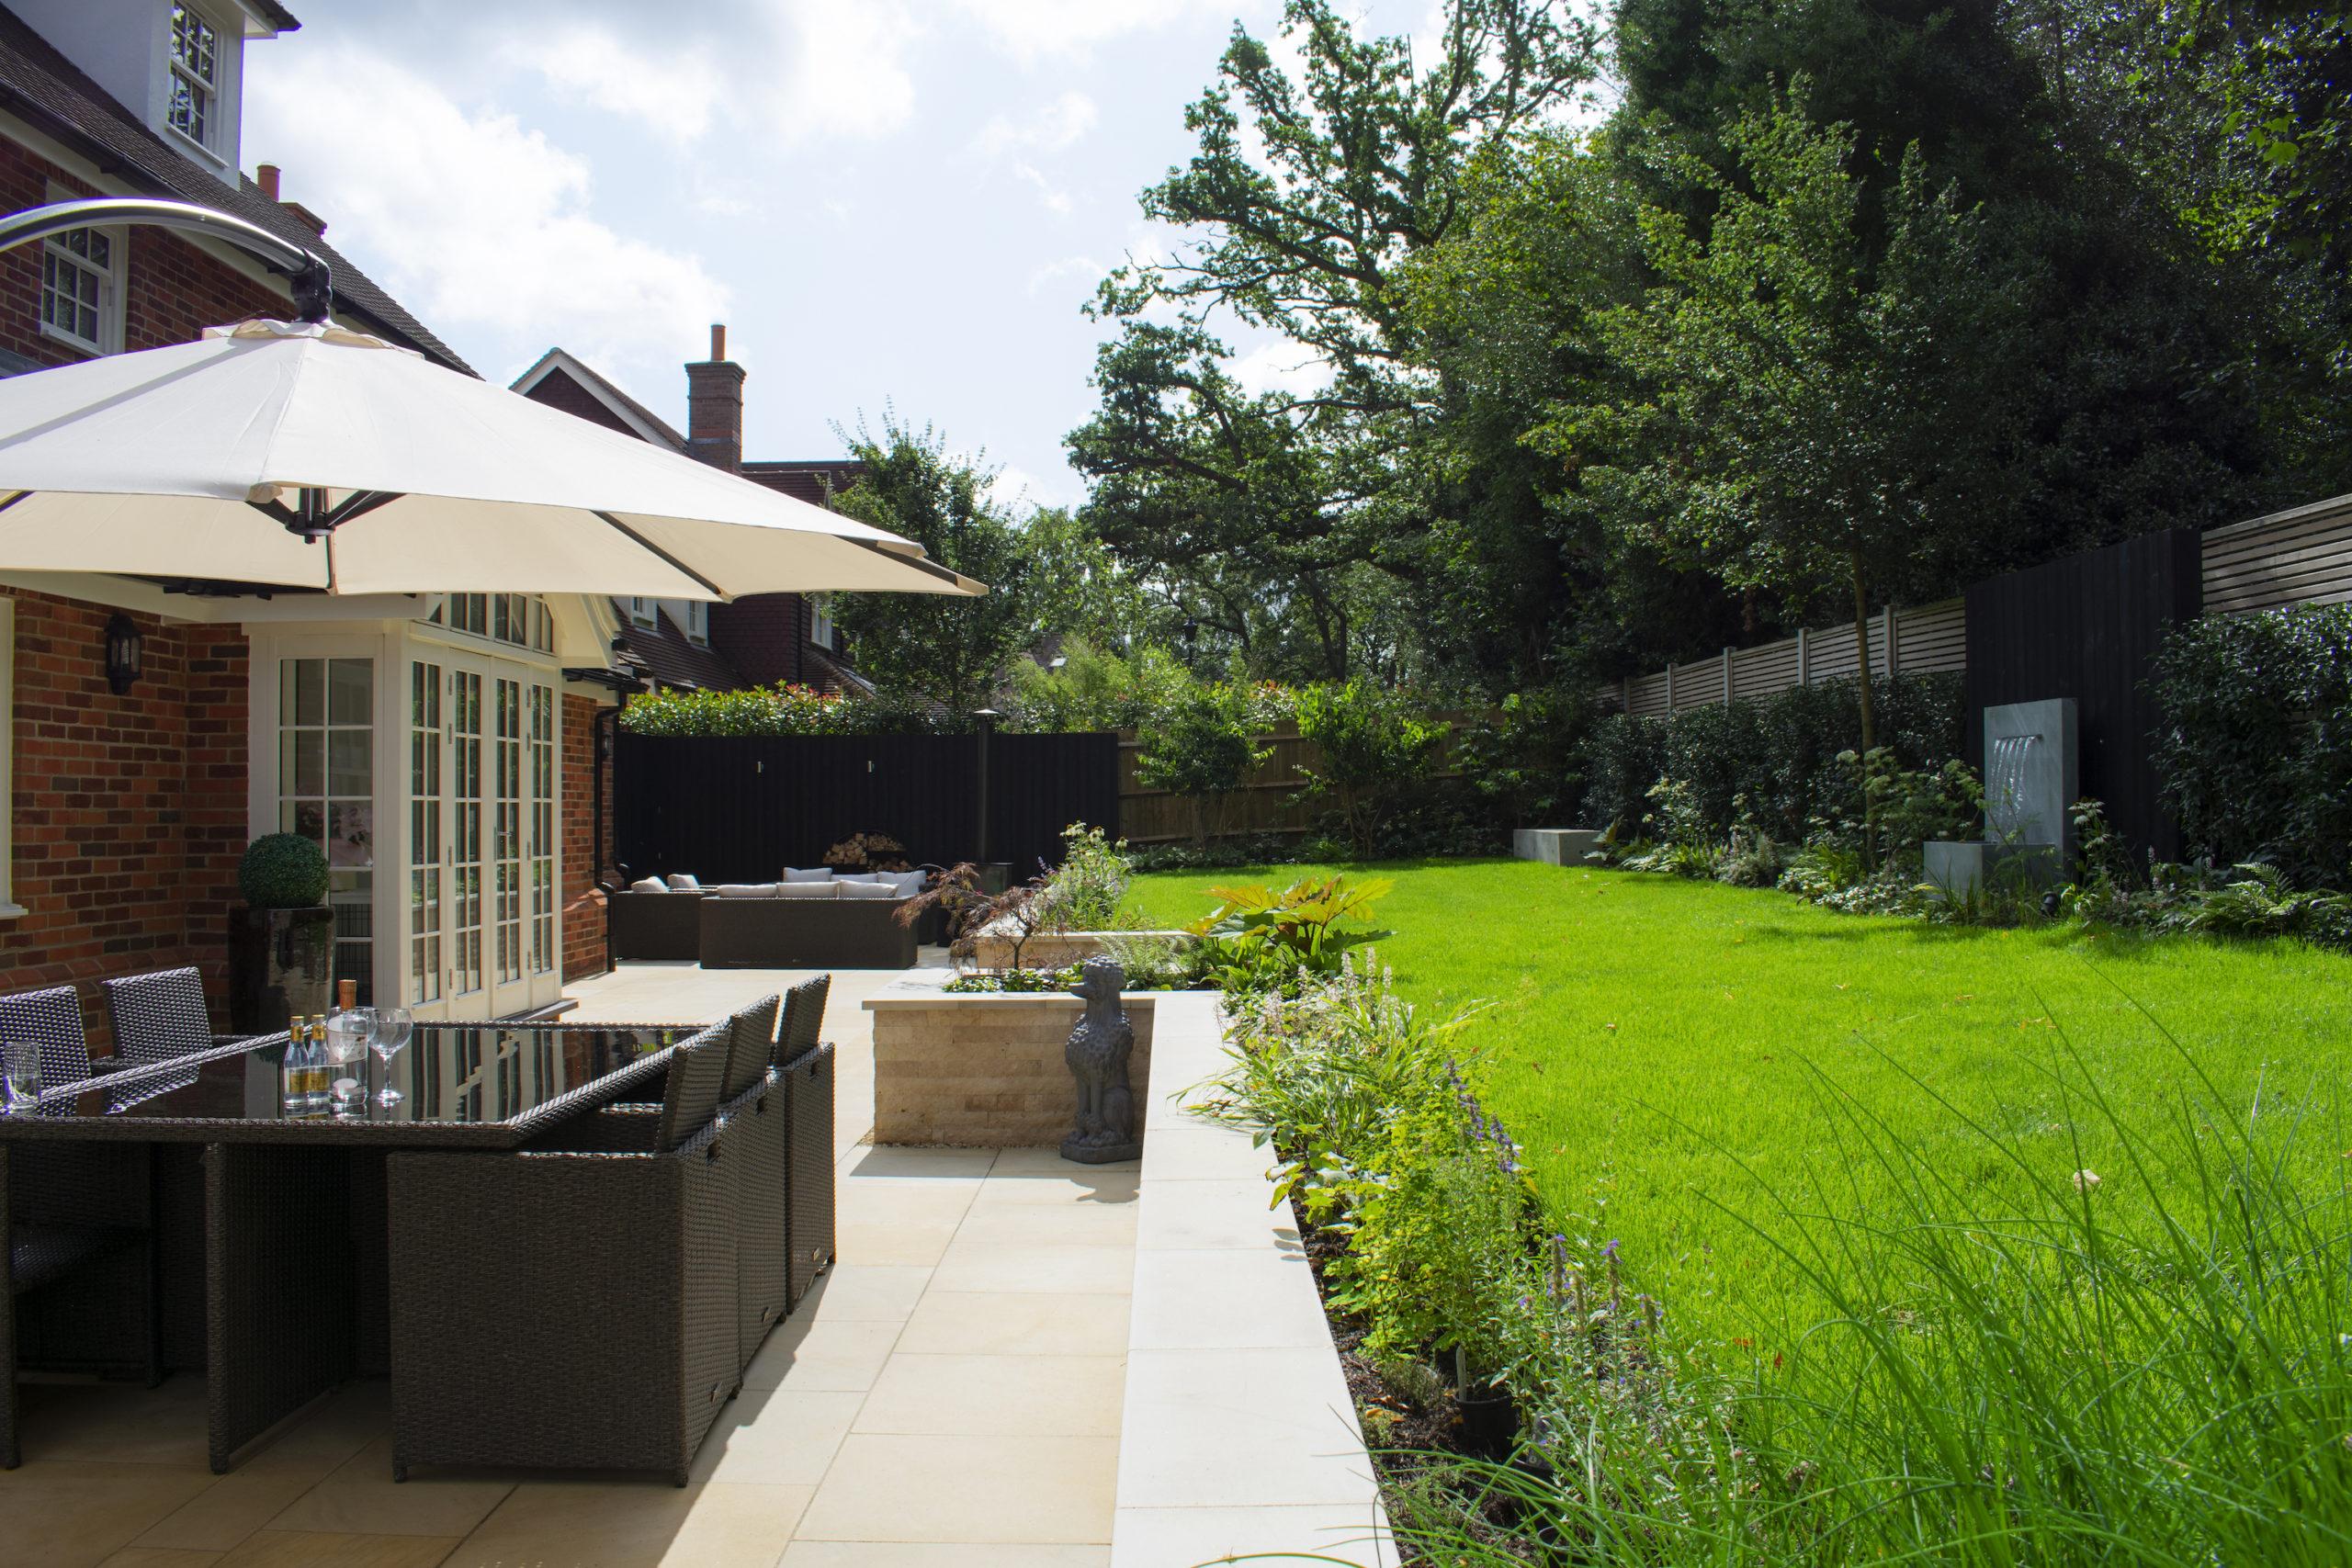 landscape gardener amersham